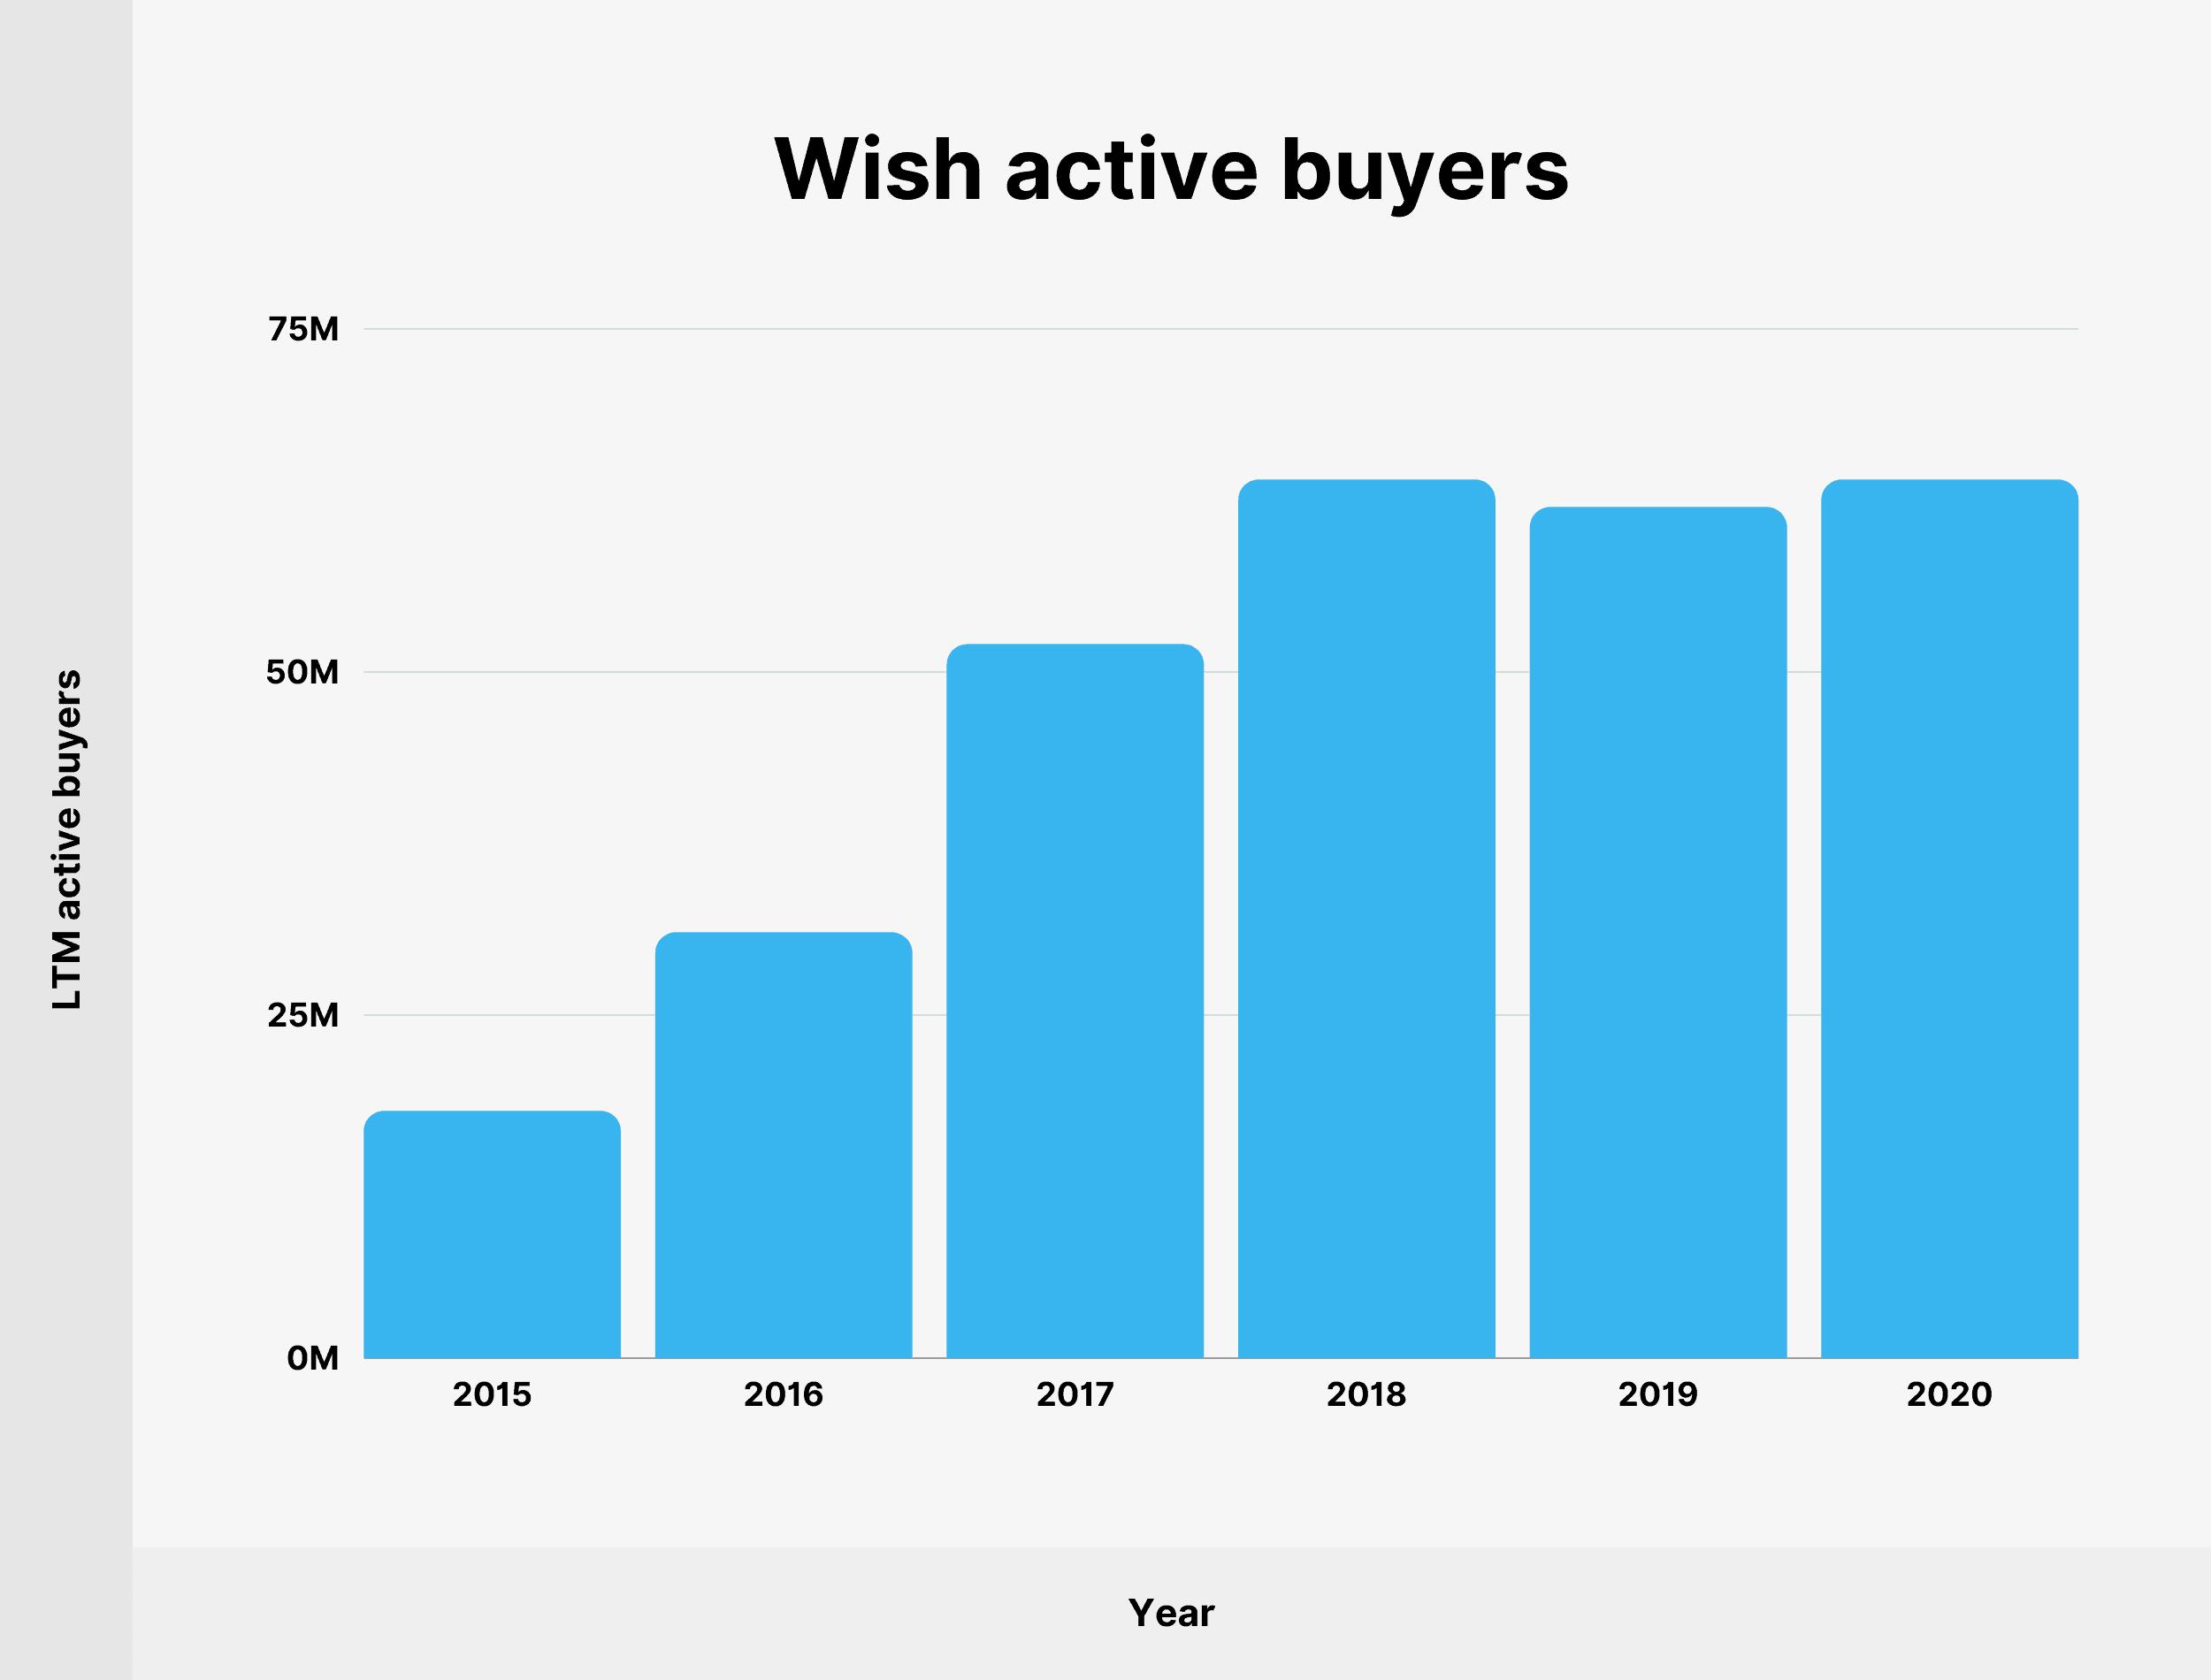 Wish active buyers